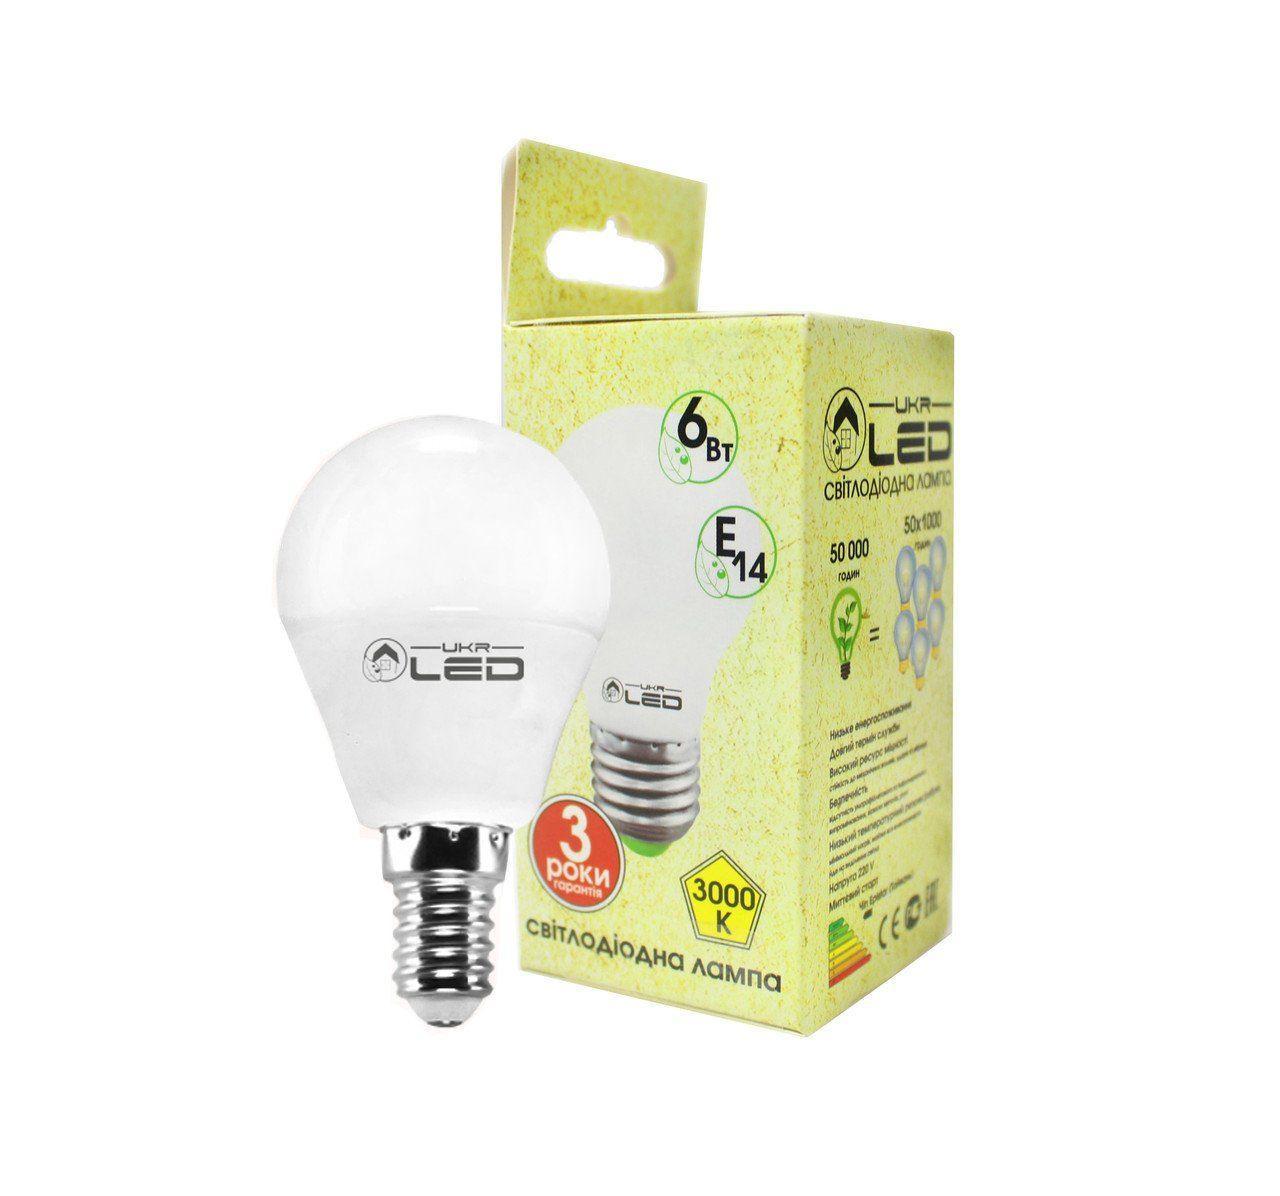 Светодиодная лампа UkrLed Е14 6W (Шарик) 3000К (530)